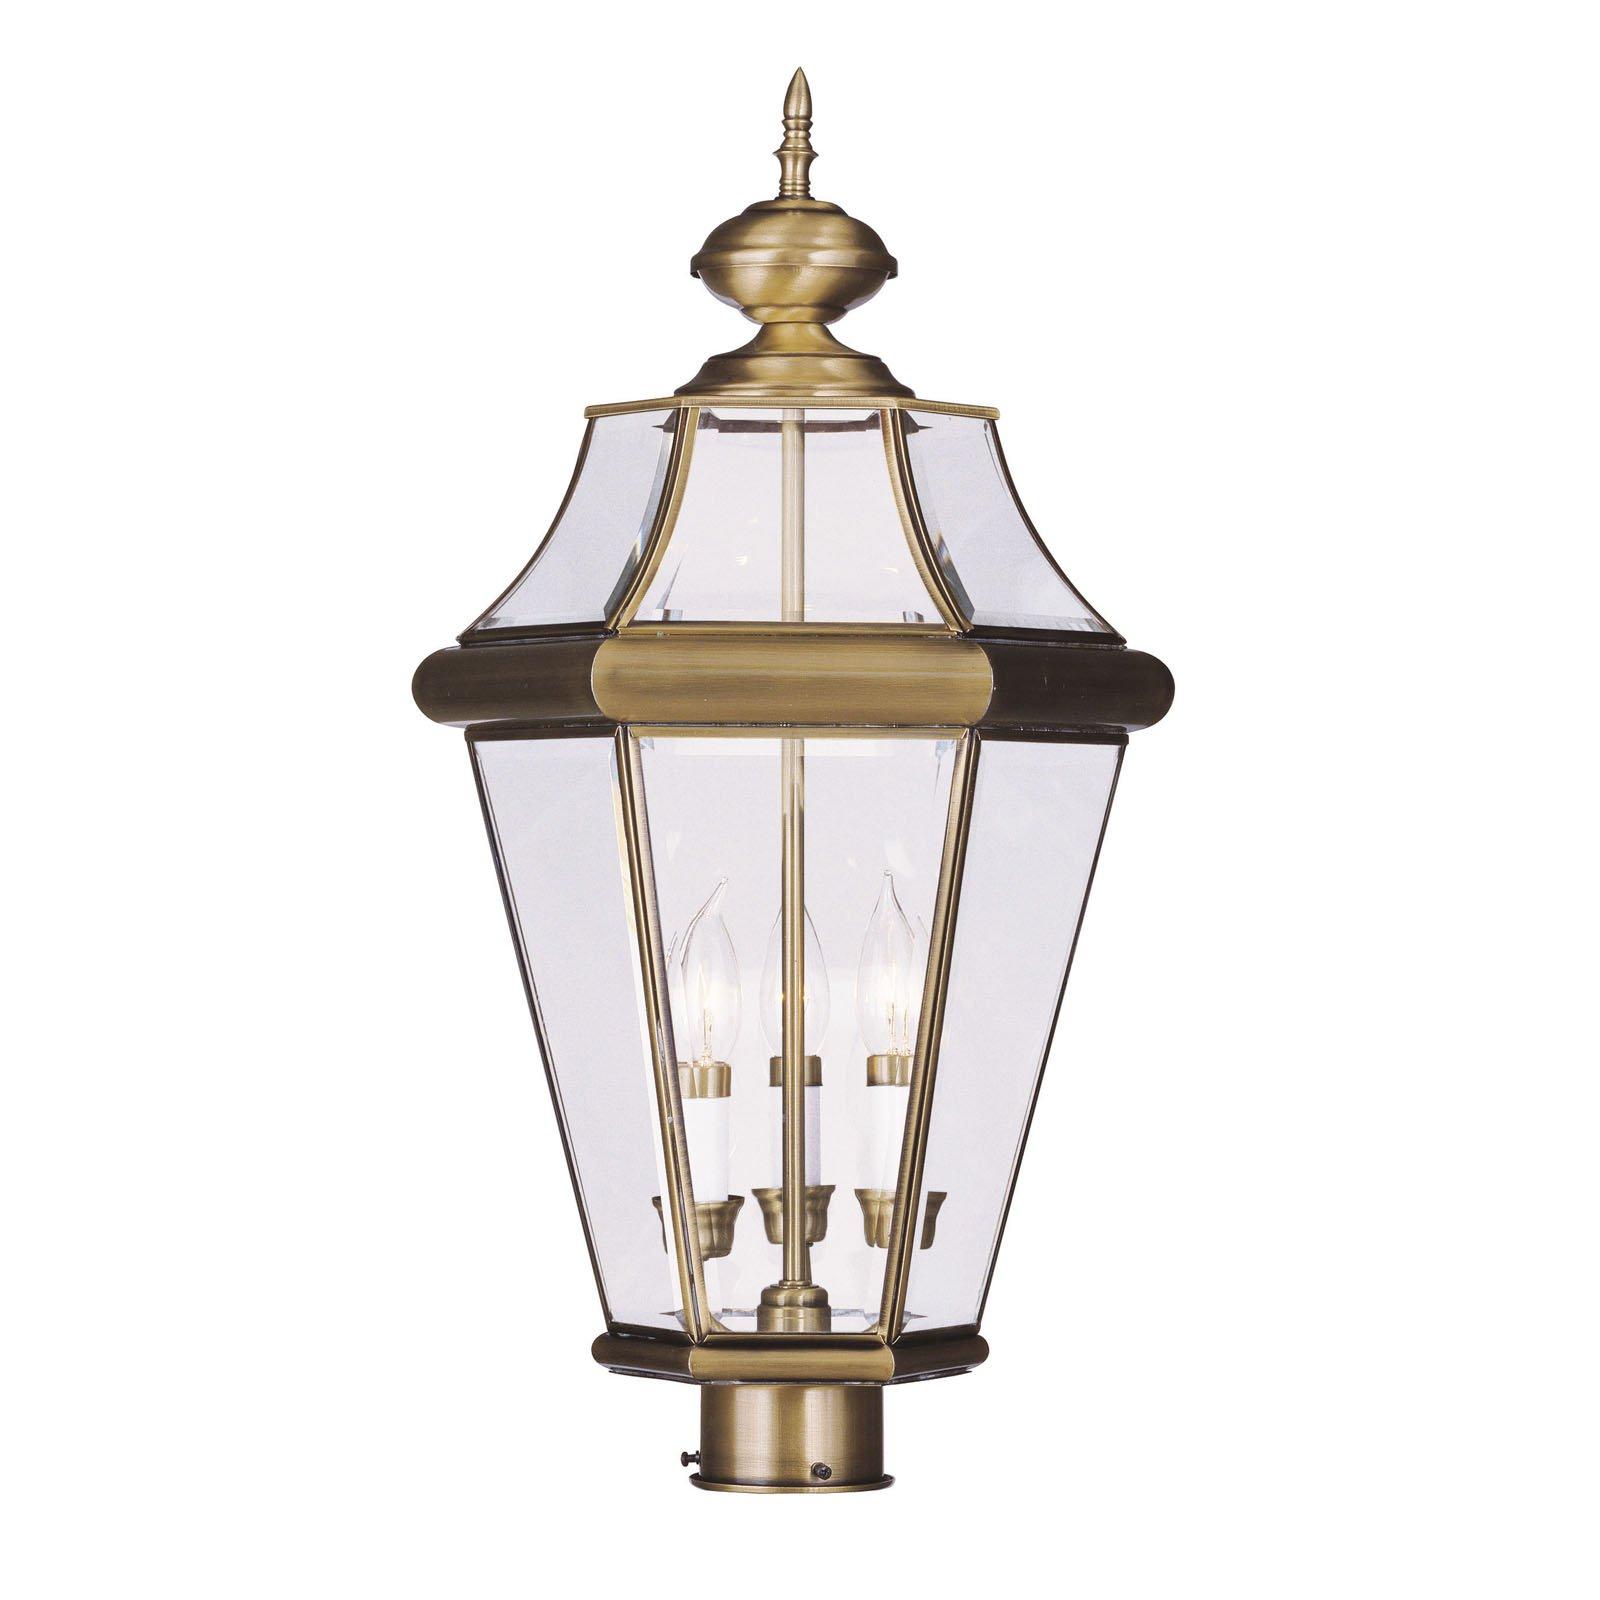 Photo of Livex Georgetown 2364-01 Outdoor Post Lantern